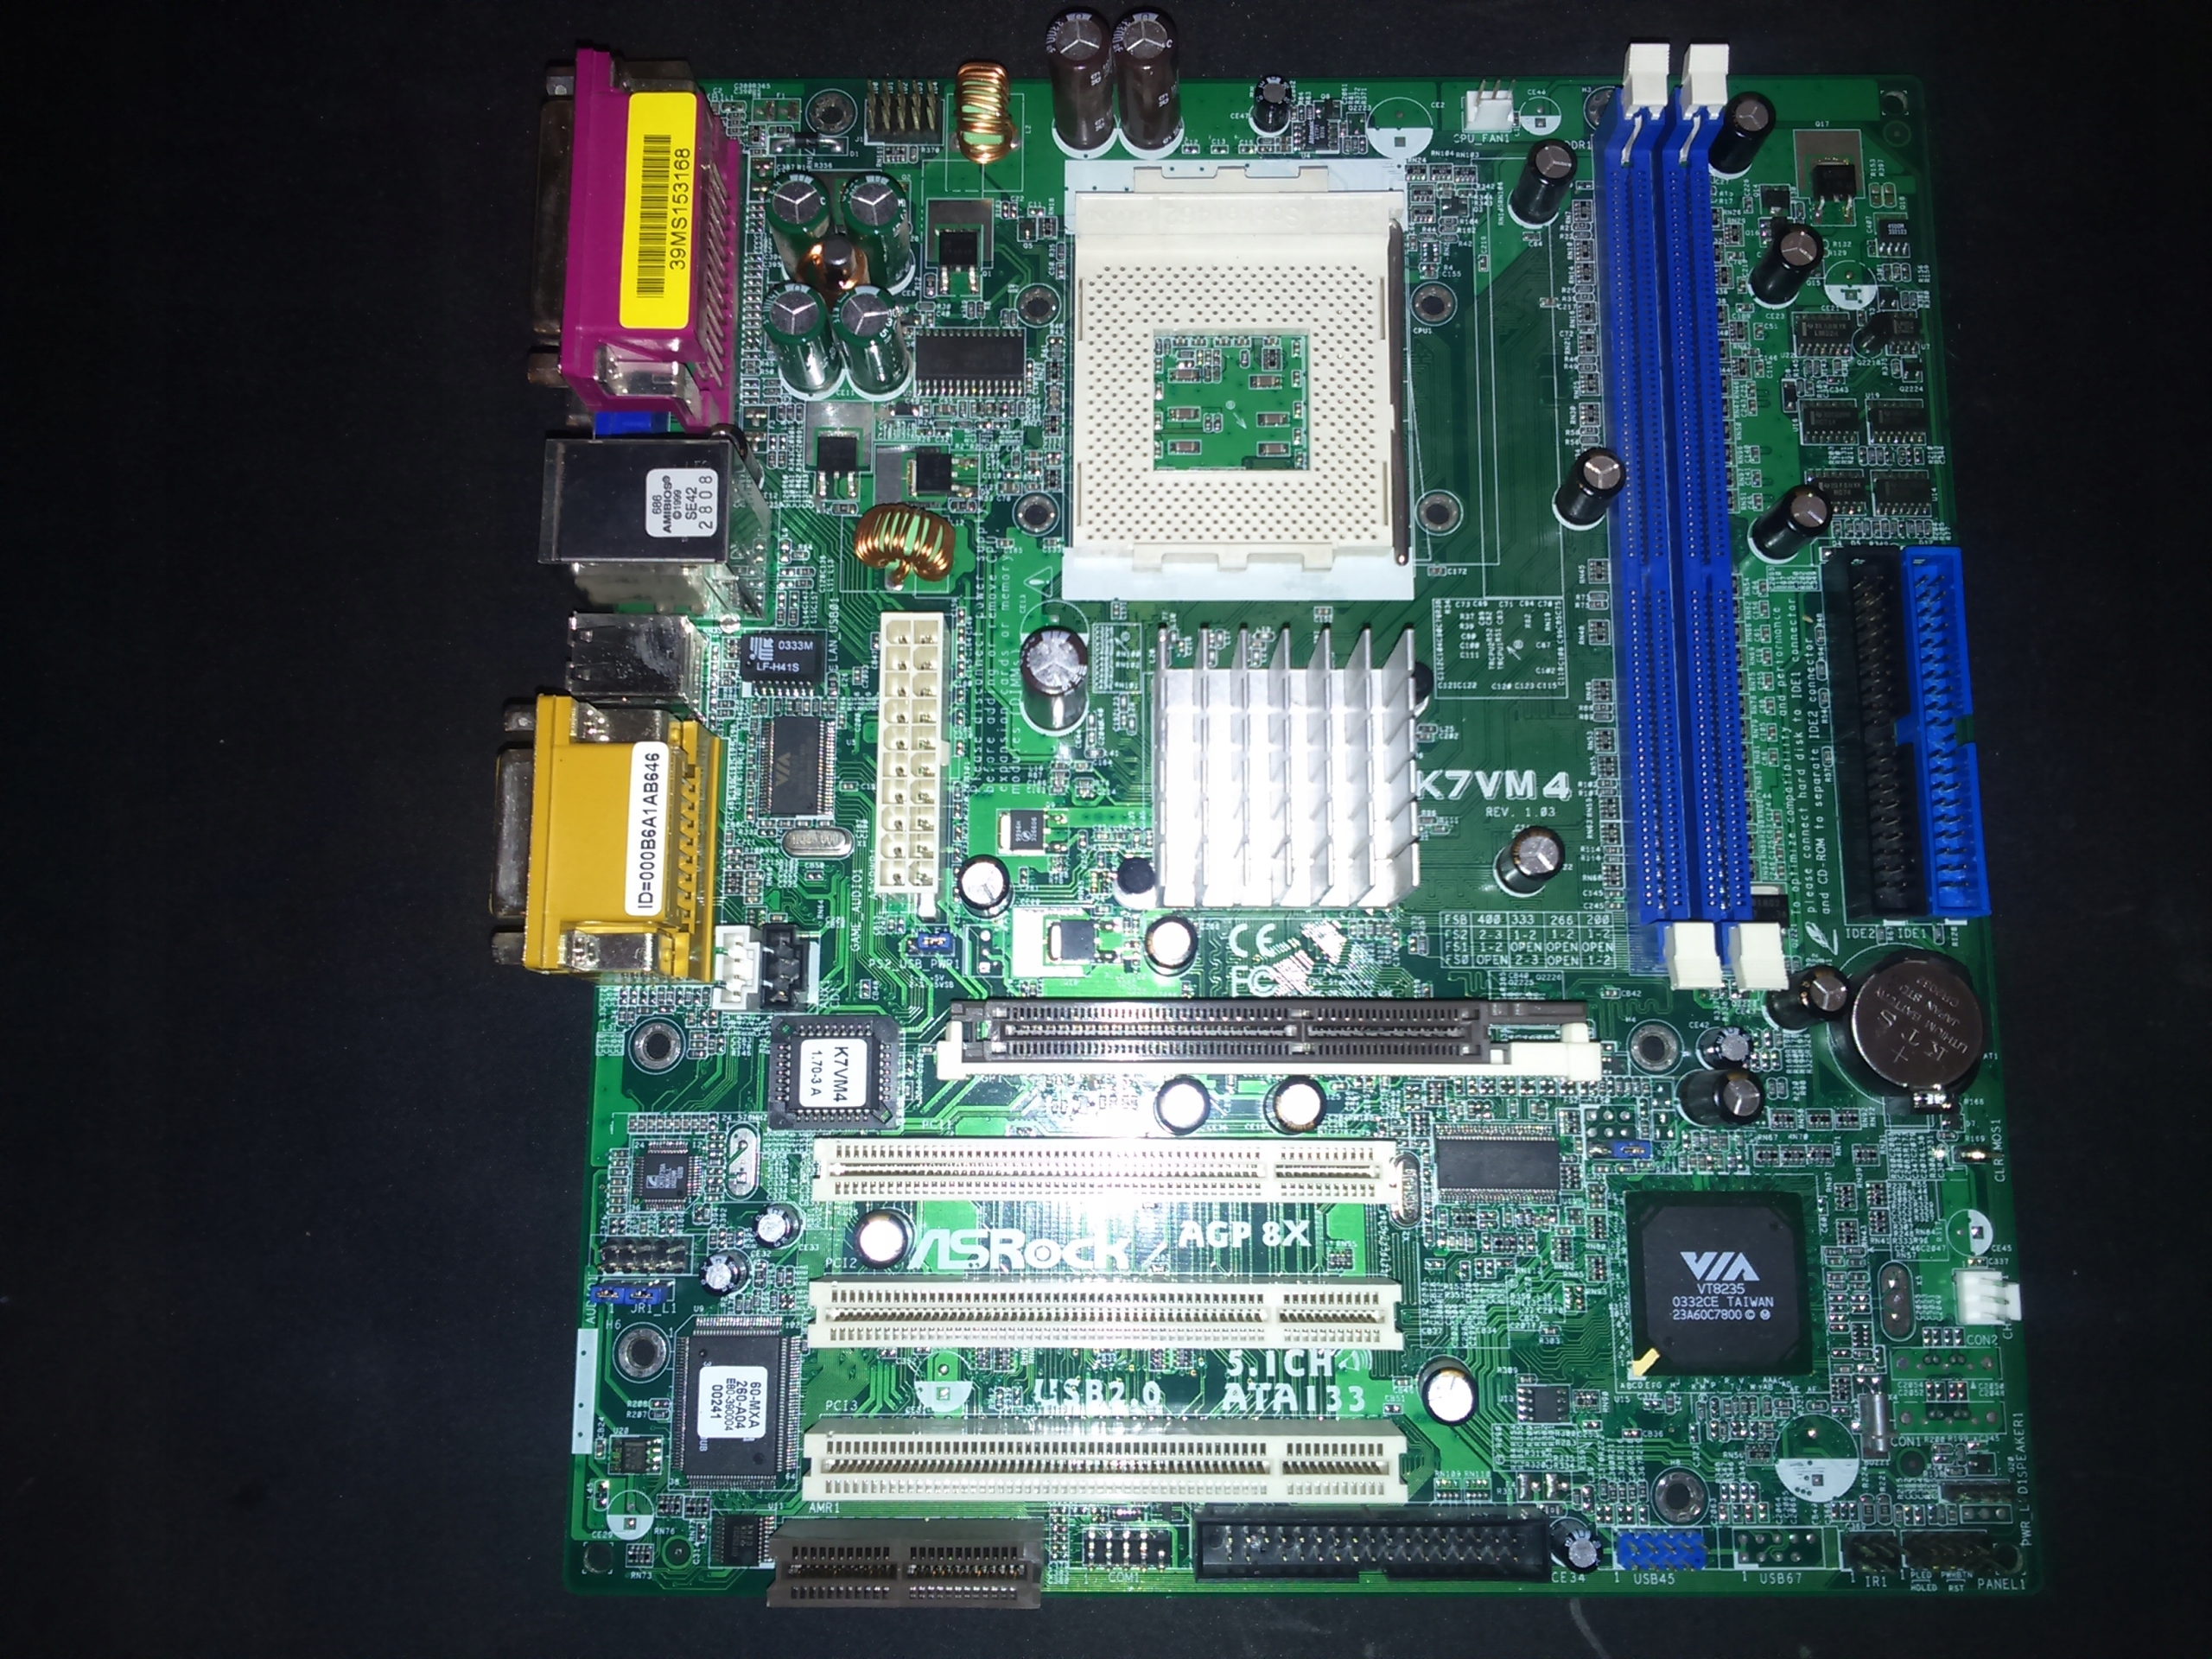 ASROCK K7VM4 VGA 64BIT DRIVER DOWNLOAD